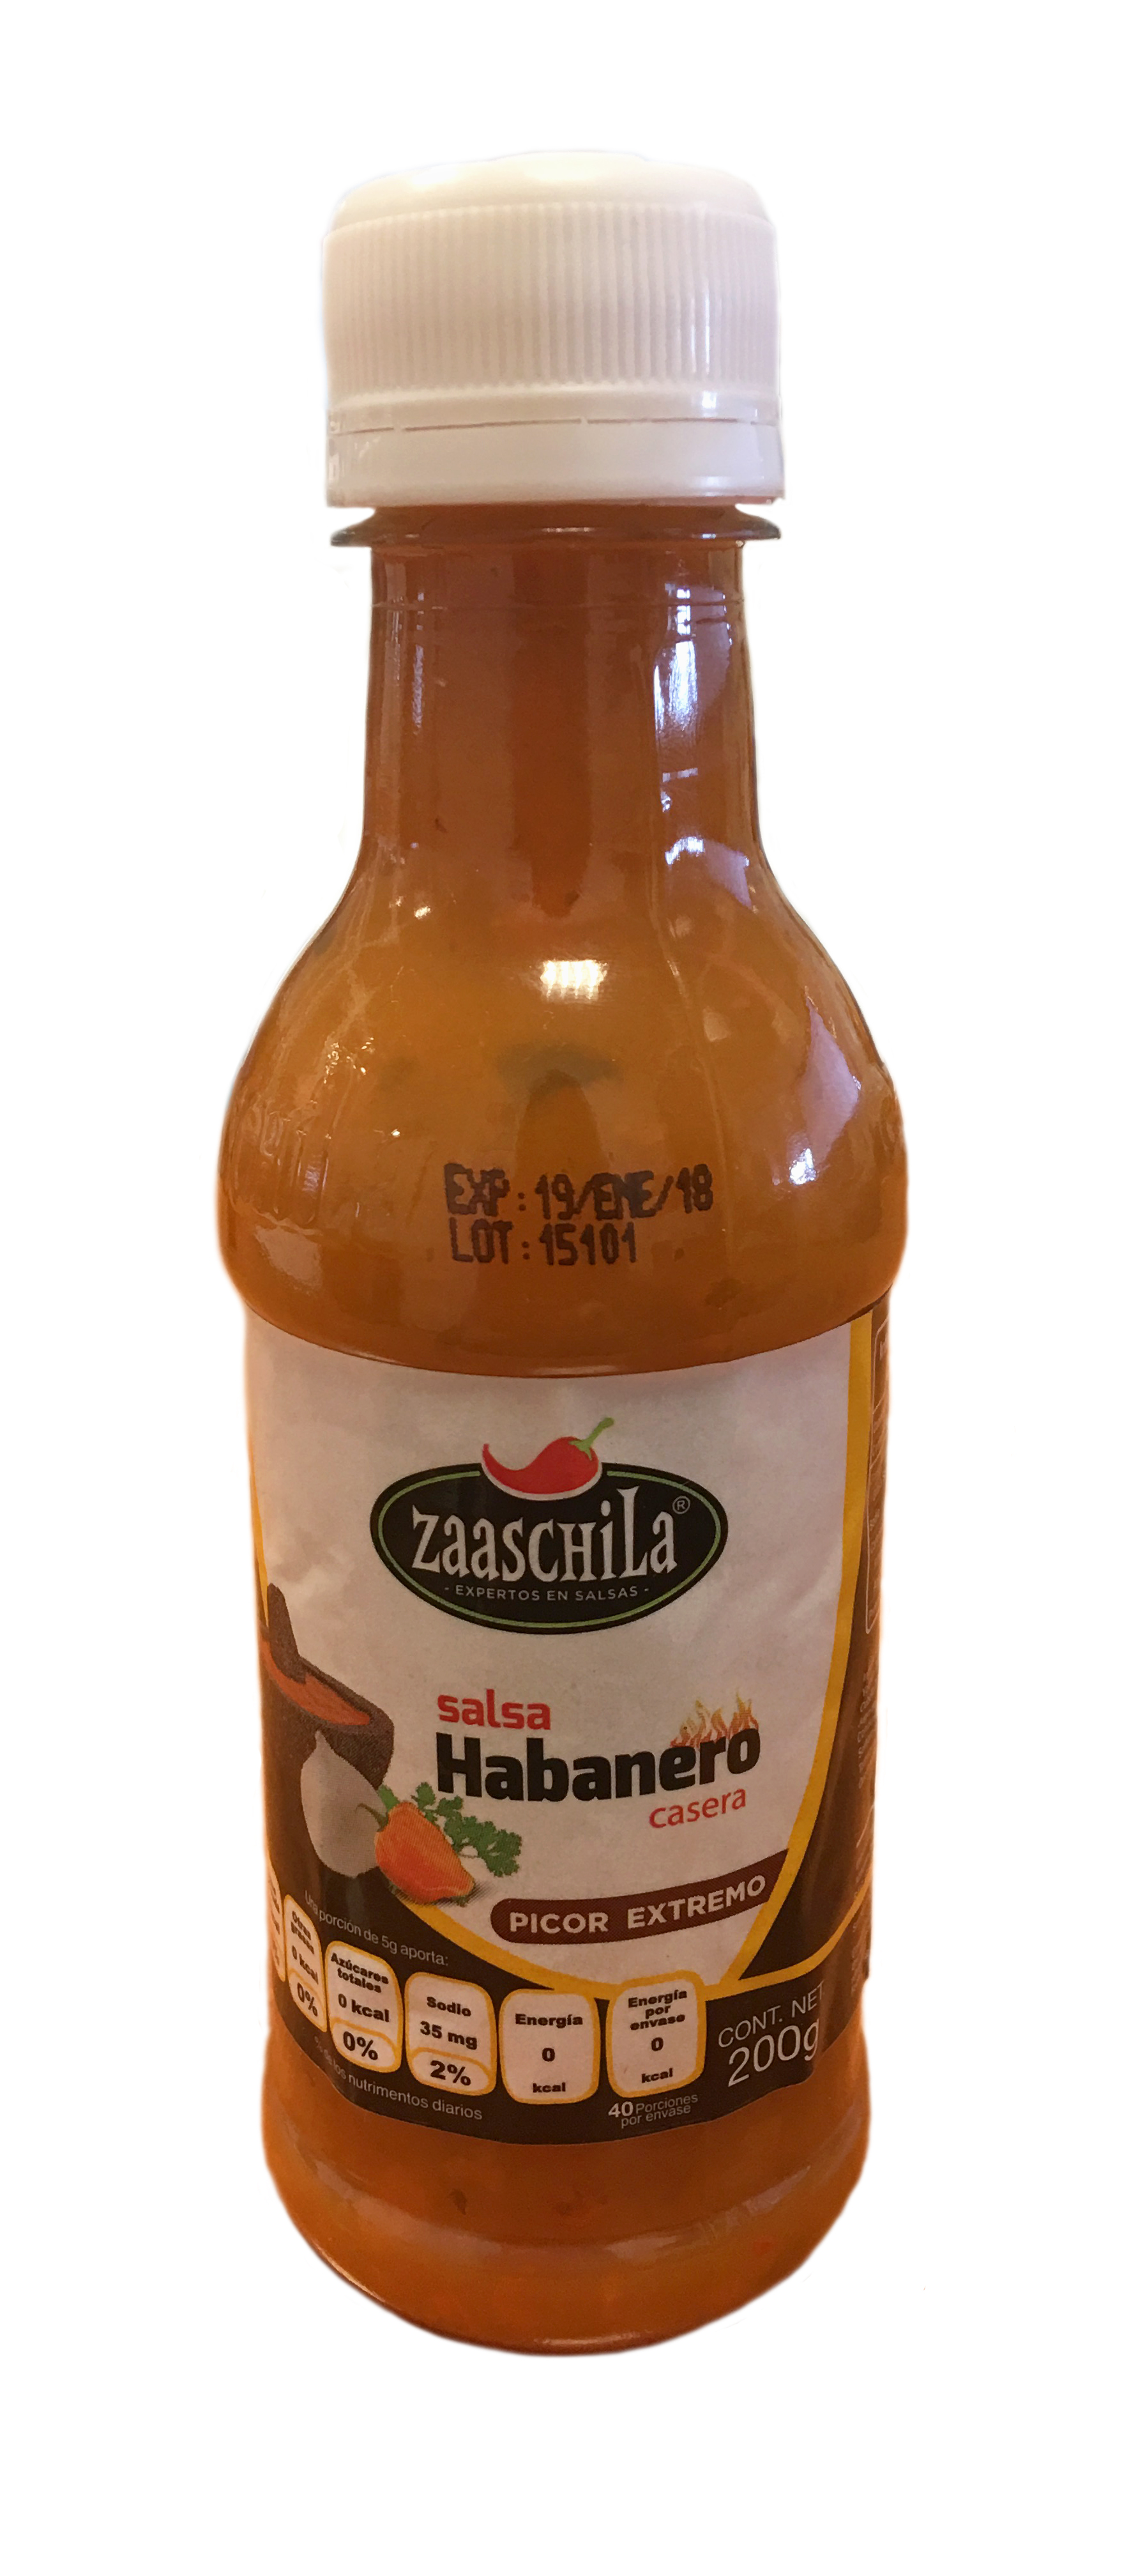 Salsa de Habanero cremosa Zaaschila 200g botella de plastico